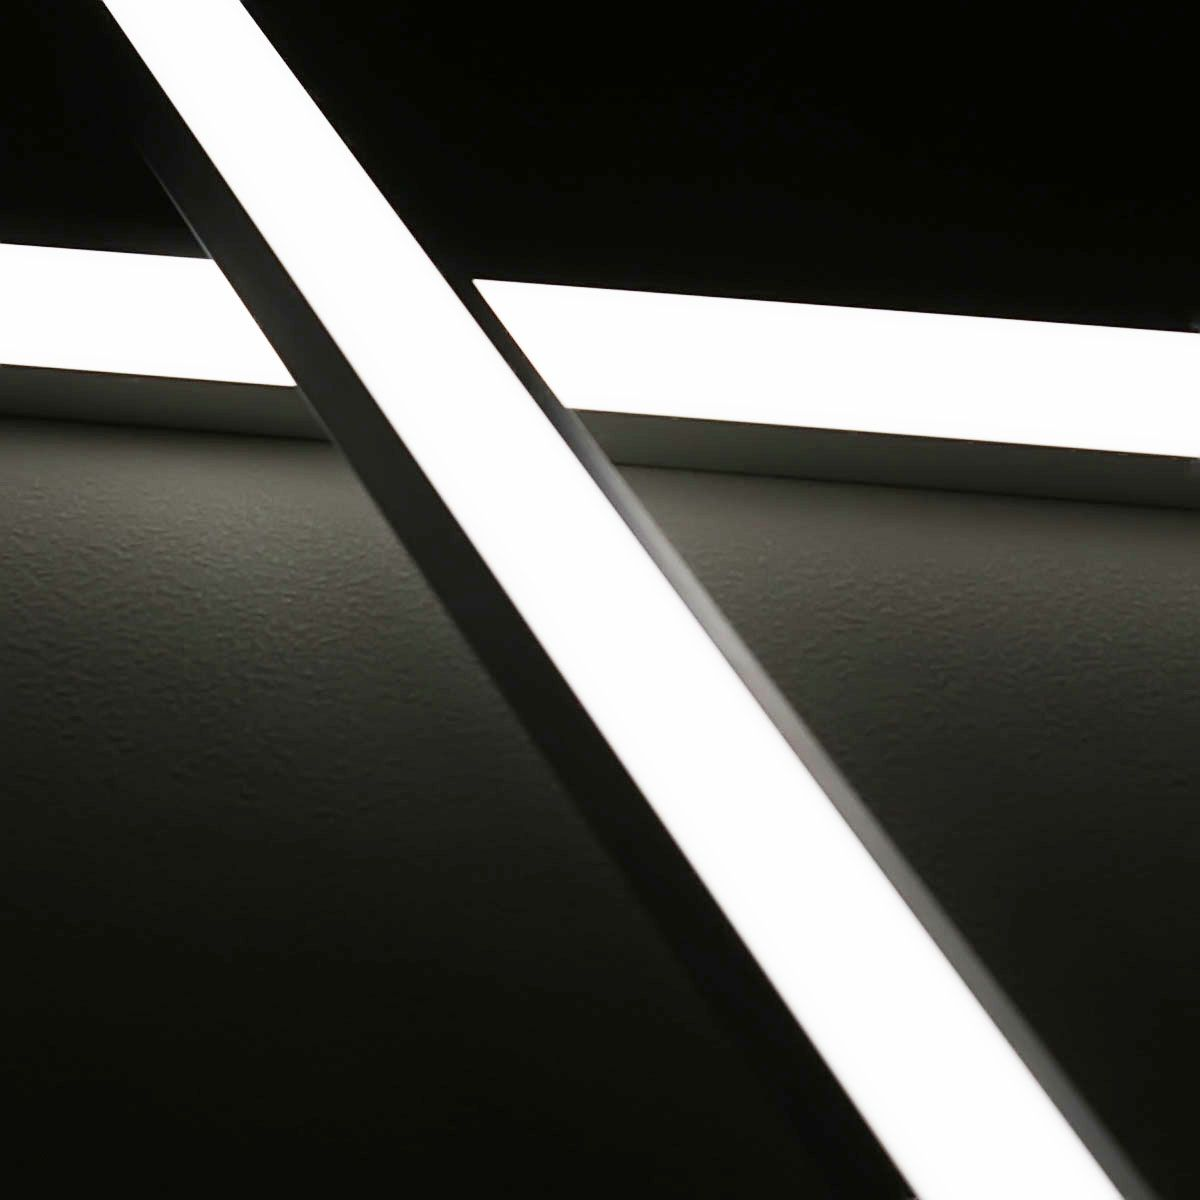 24V Aluminium LED Eckleiste – weiß – diffuse Abdeckung